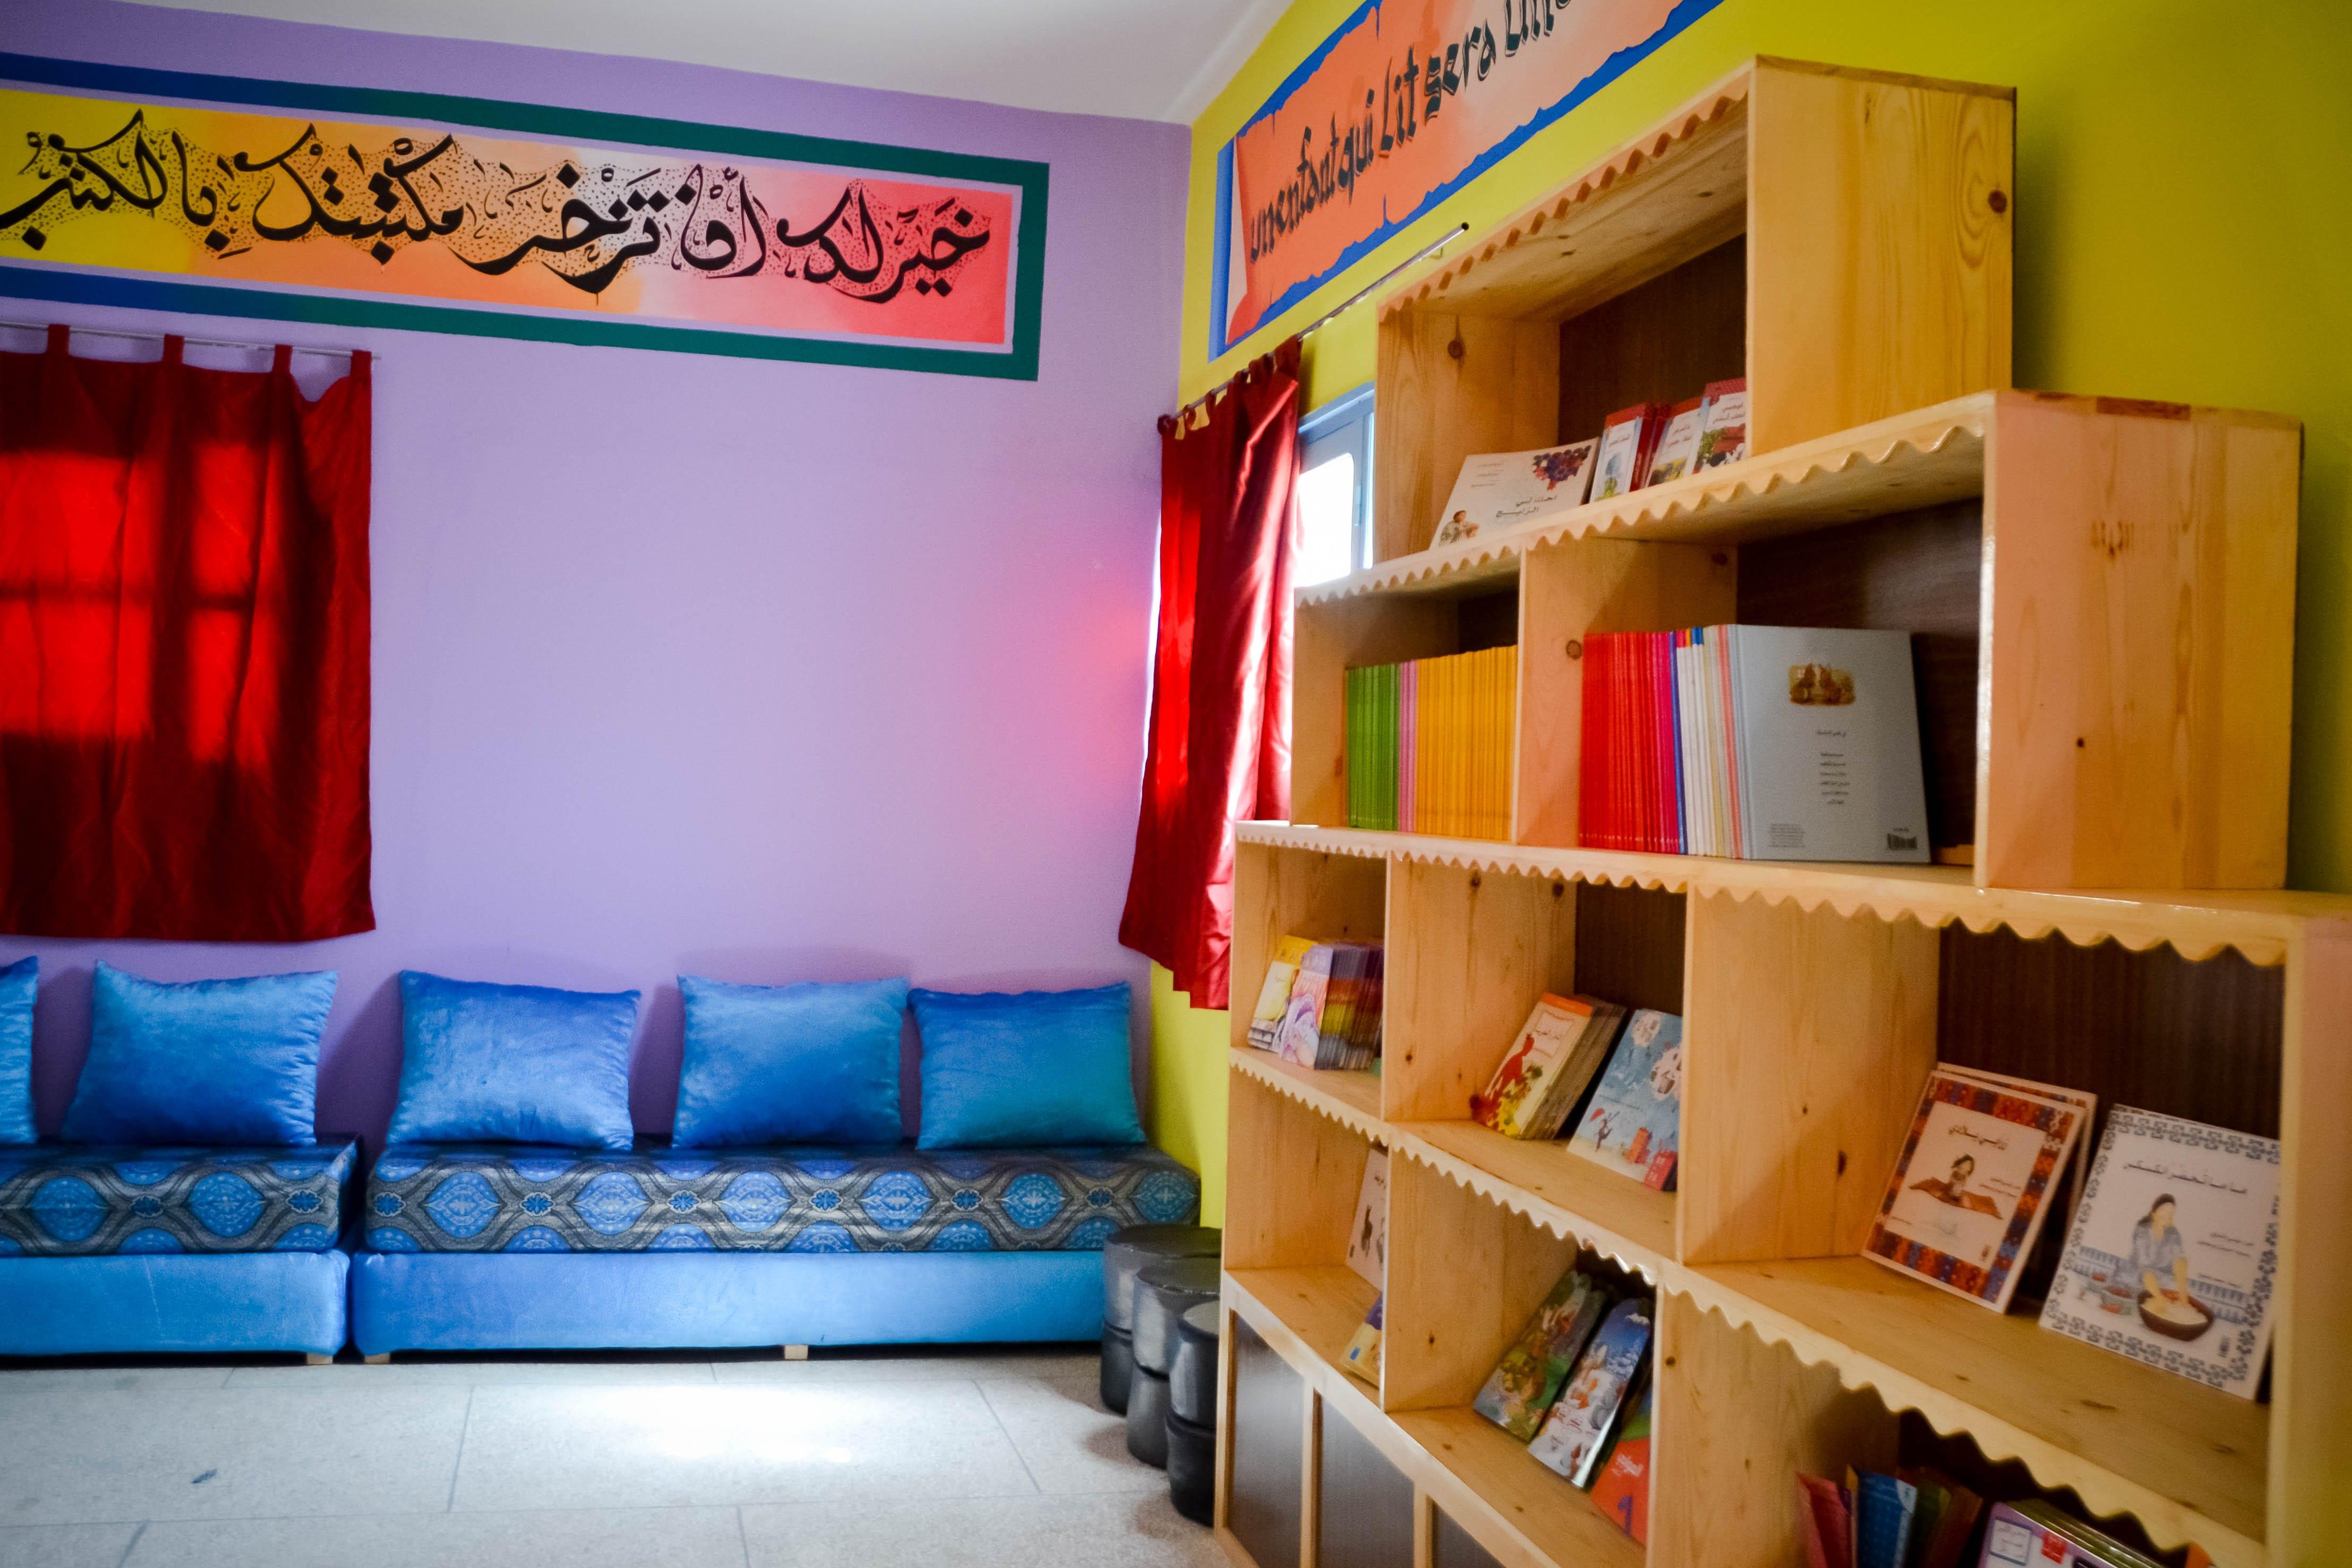 enfants du d sert apprendre lire crire compter un. Black Bedroom Furniture Sets. Home Design Ideas